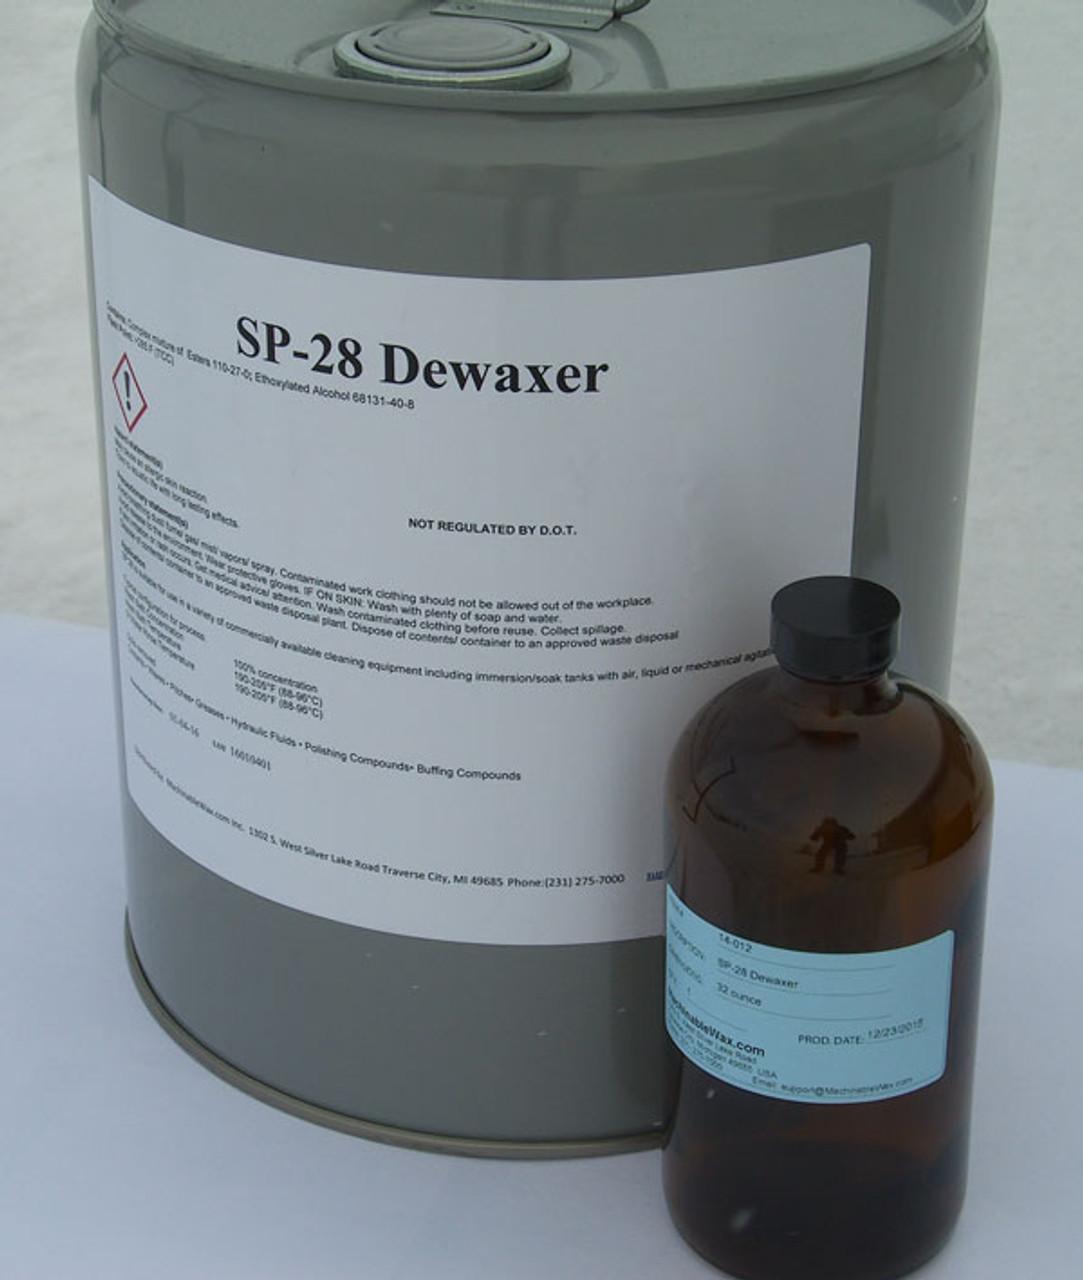 SP-28 Wax remover / dewaxer